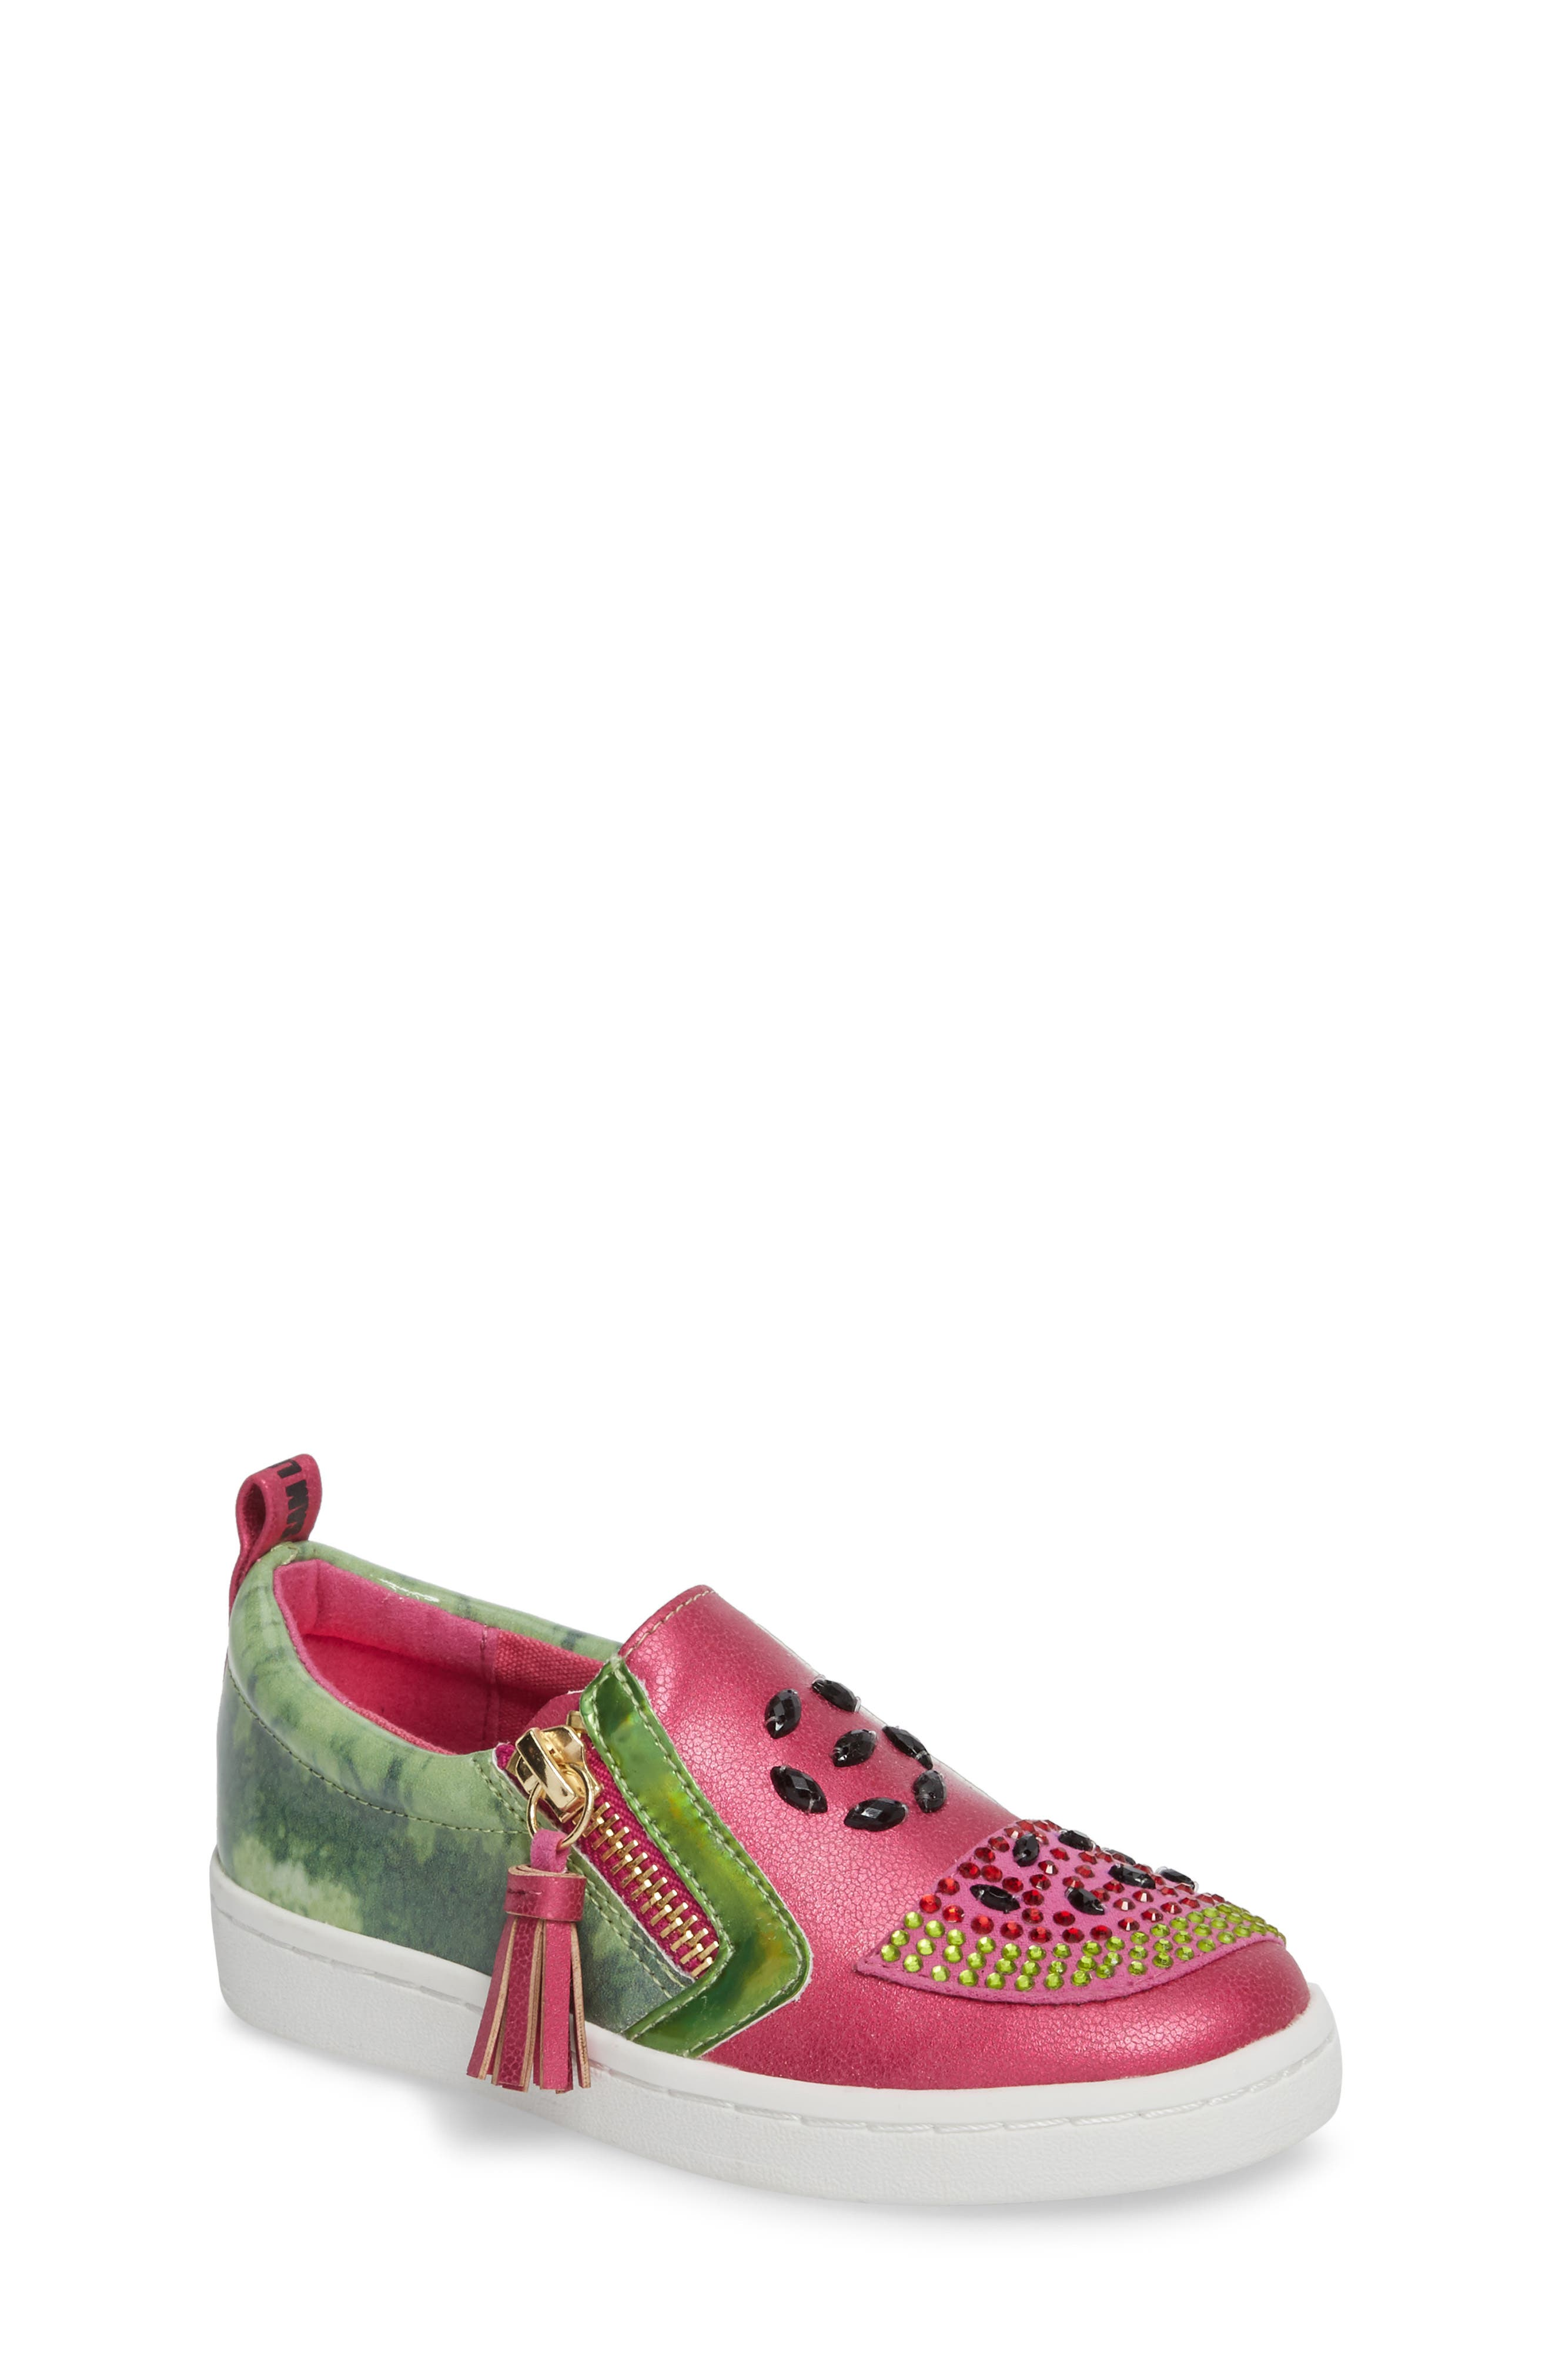 Blane Watermelon Sneaker,                             Main thumbnail 1, color,                             Fuchsia Patent Leather